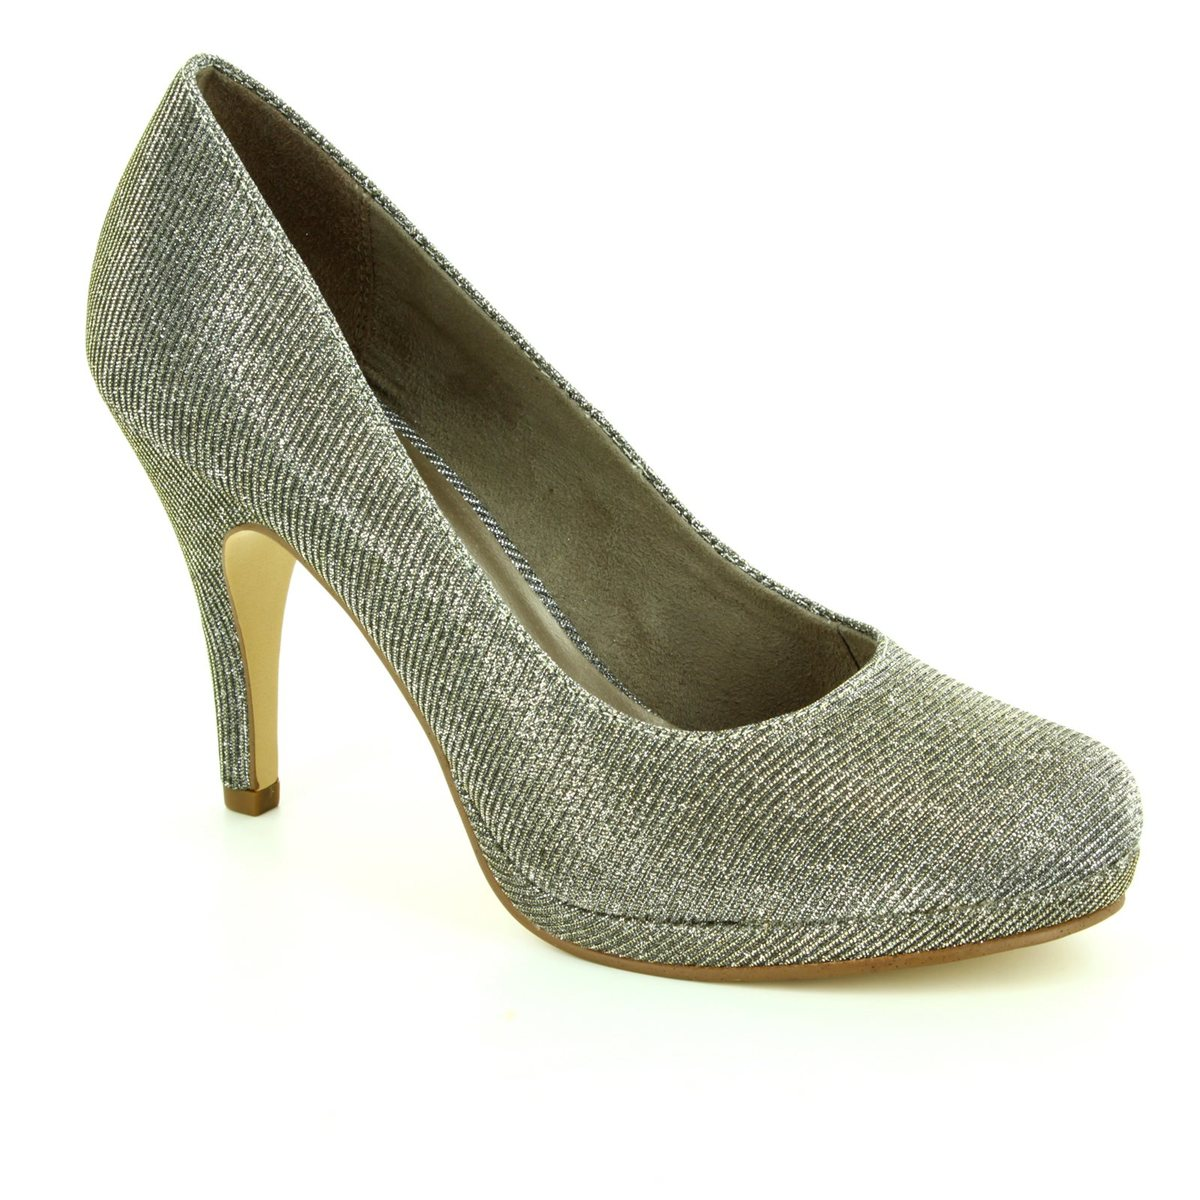 Tamaris High-heeled Shoes - Platinum - 22407 970 TAGGIA 8fae905932